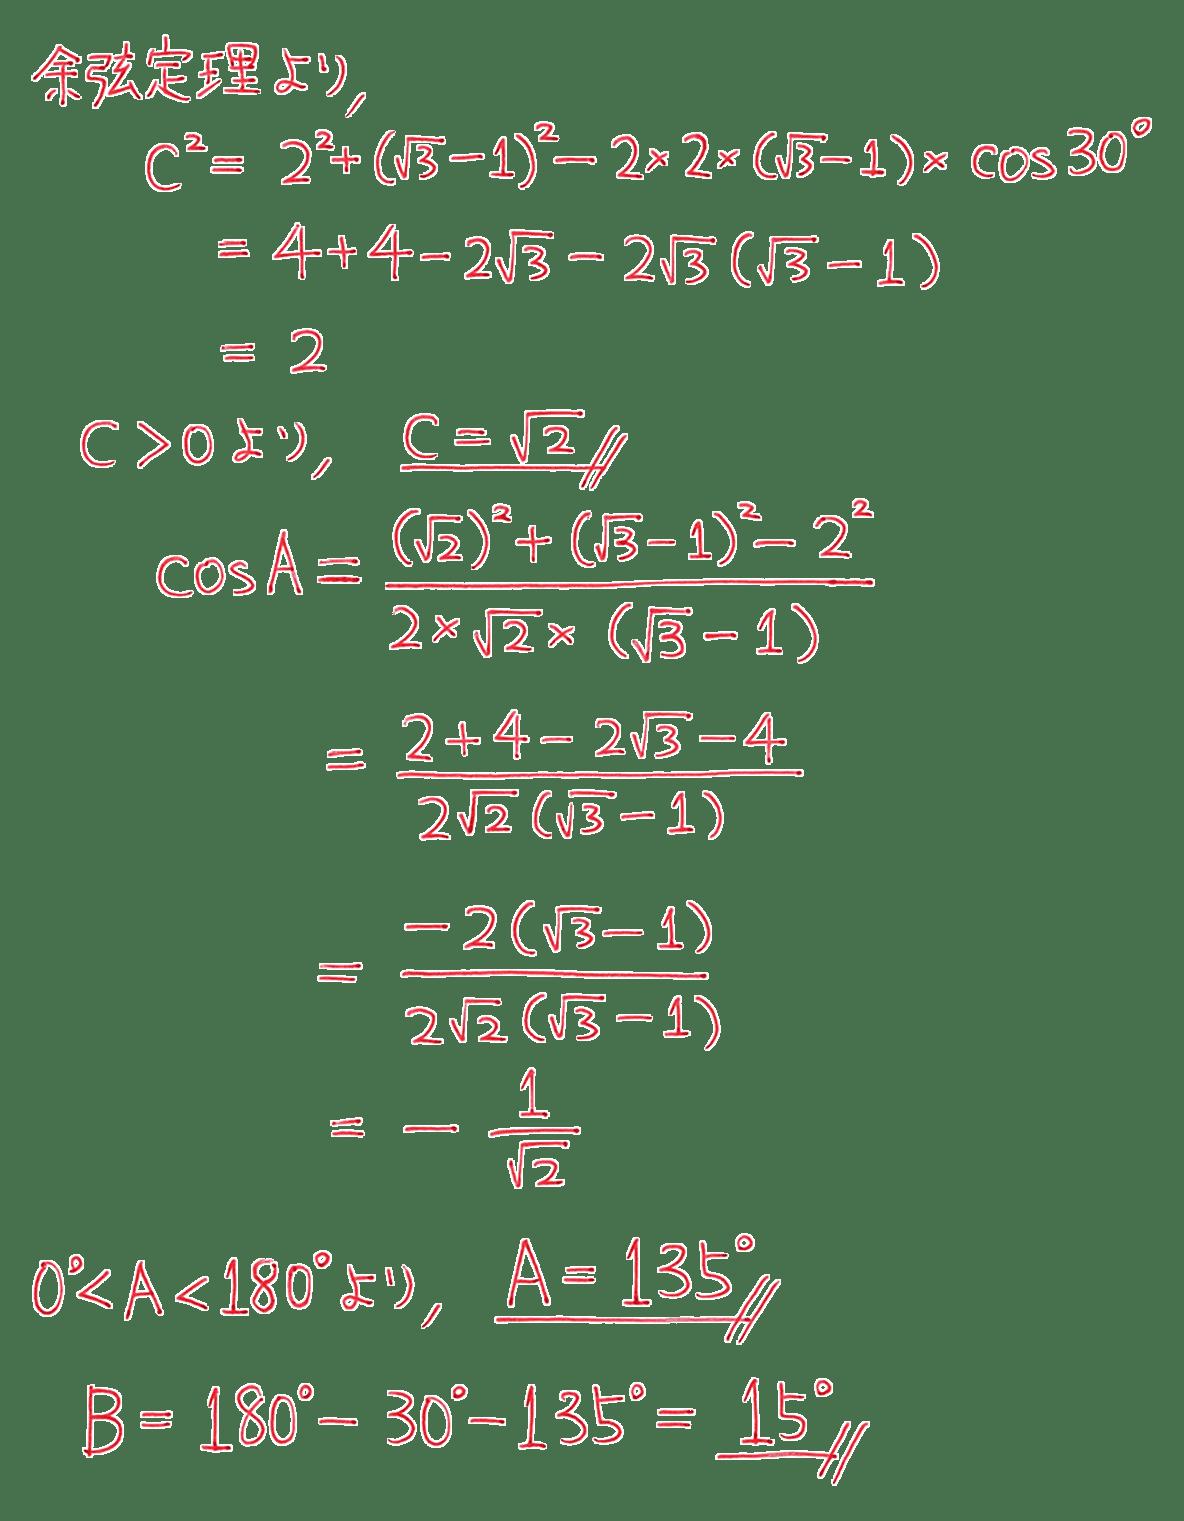 高校数学Ⅰ 三角比26 練習の答え